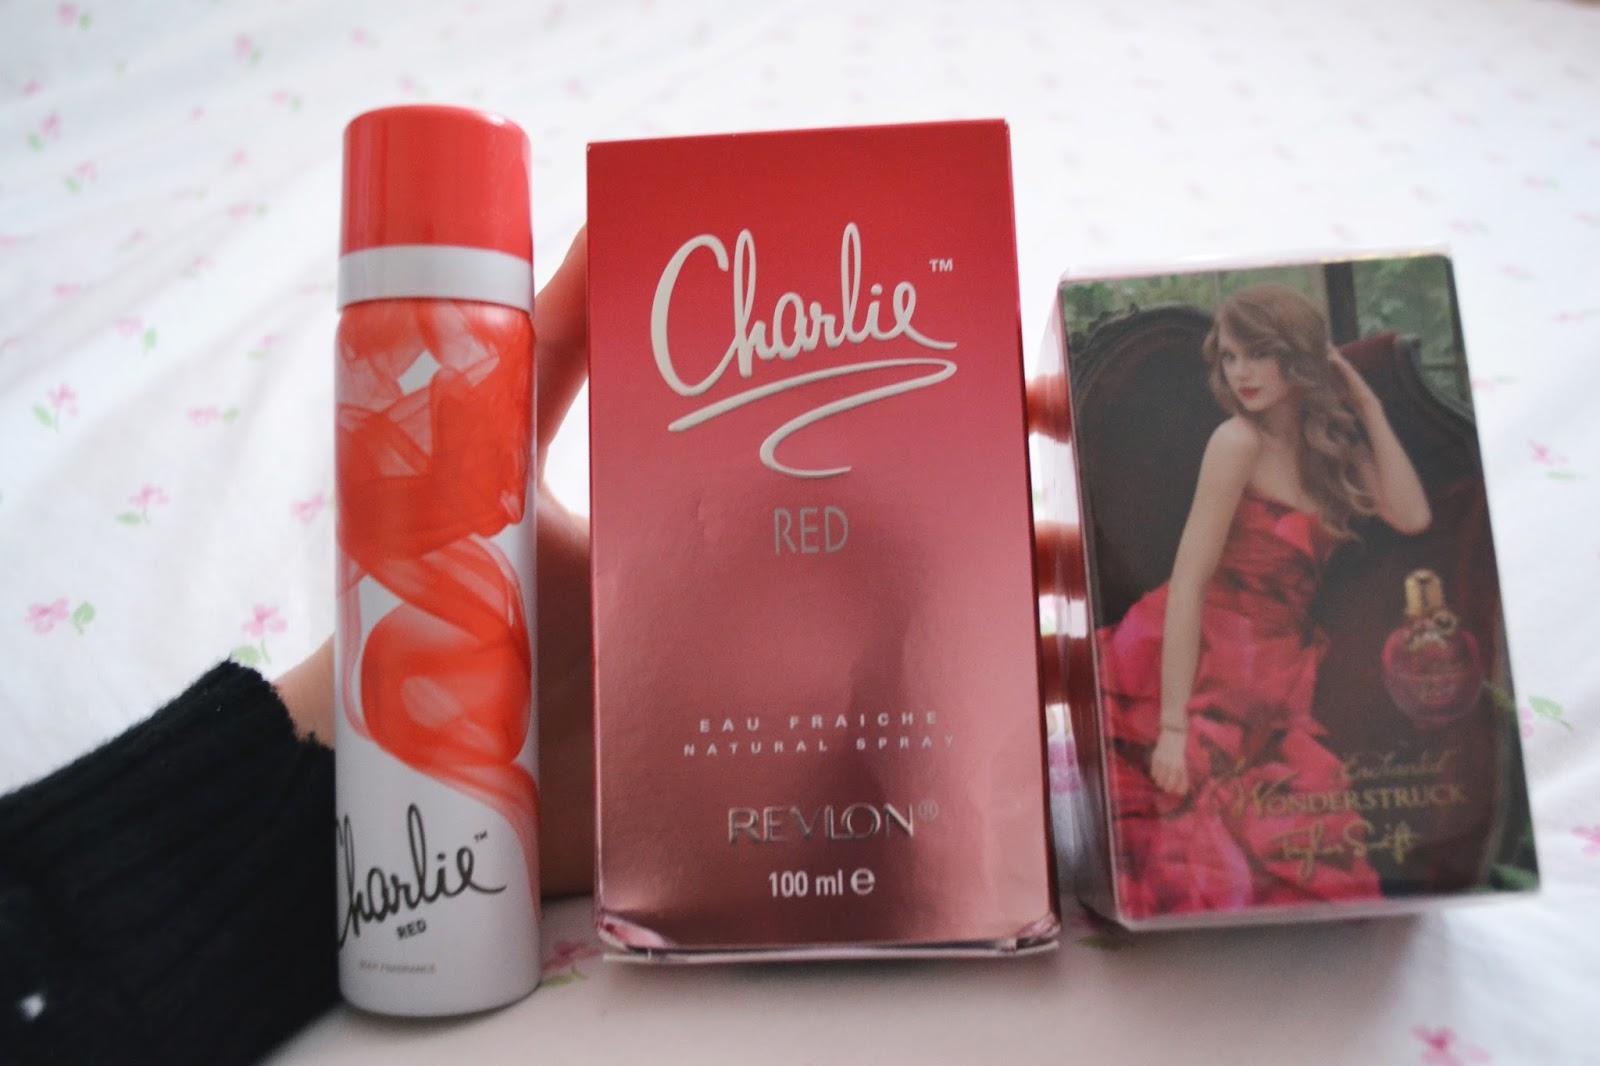 charlie red taylor swift wonderstruck enchanted perfume